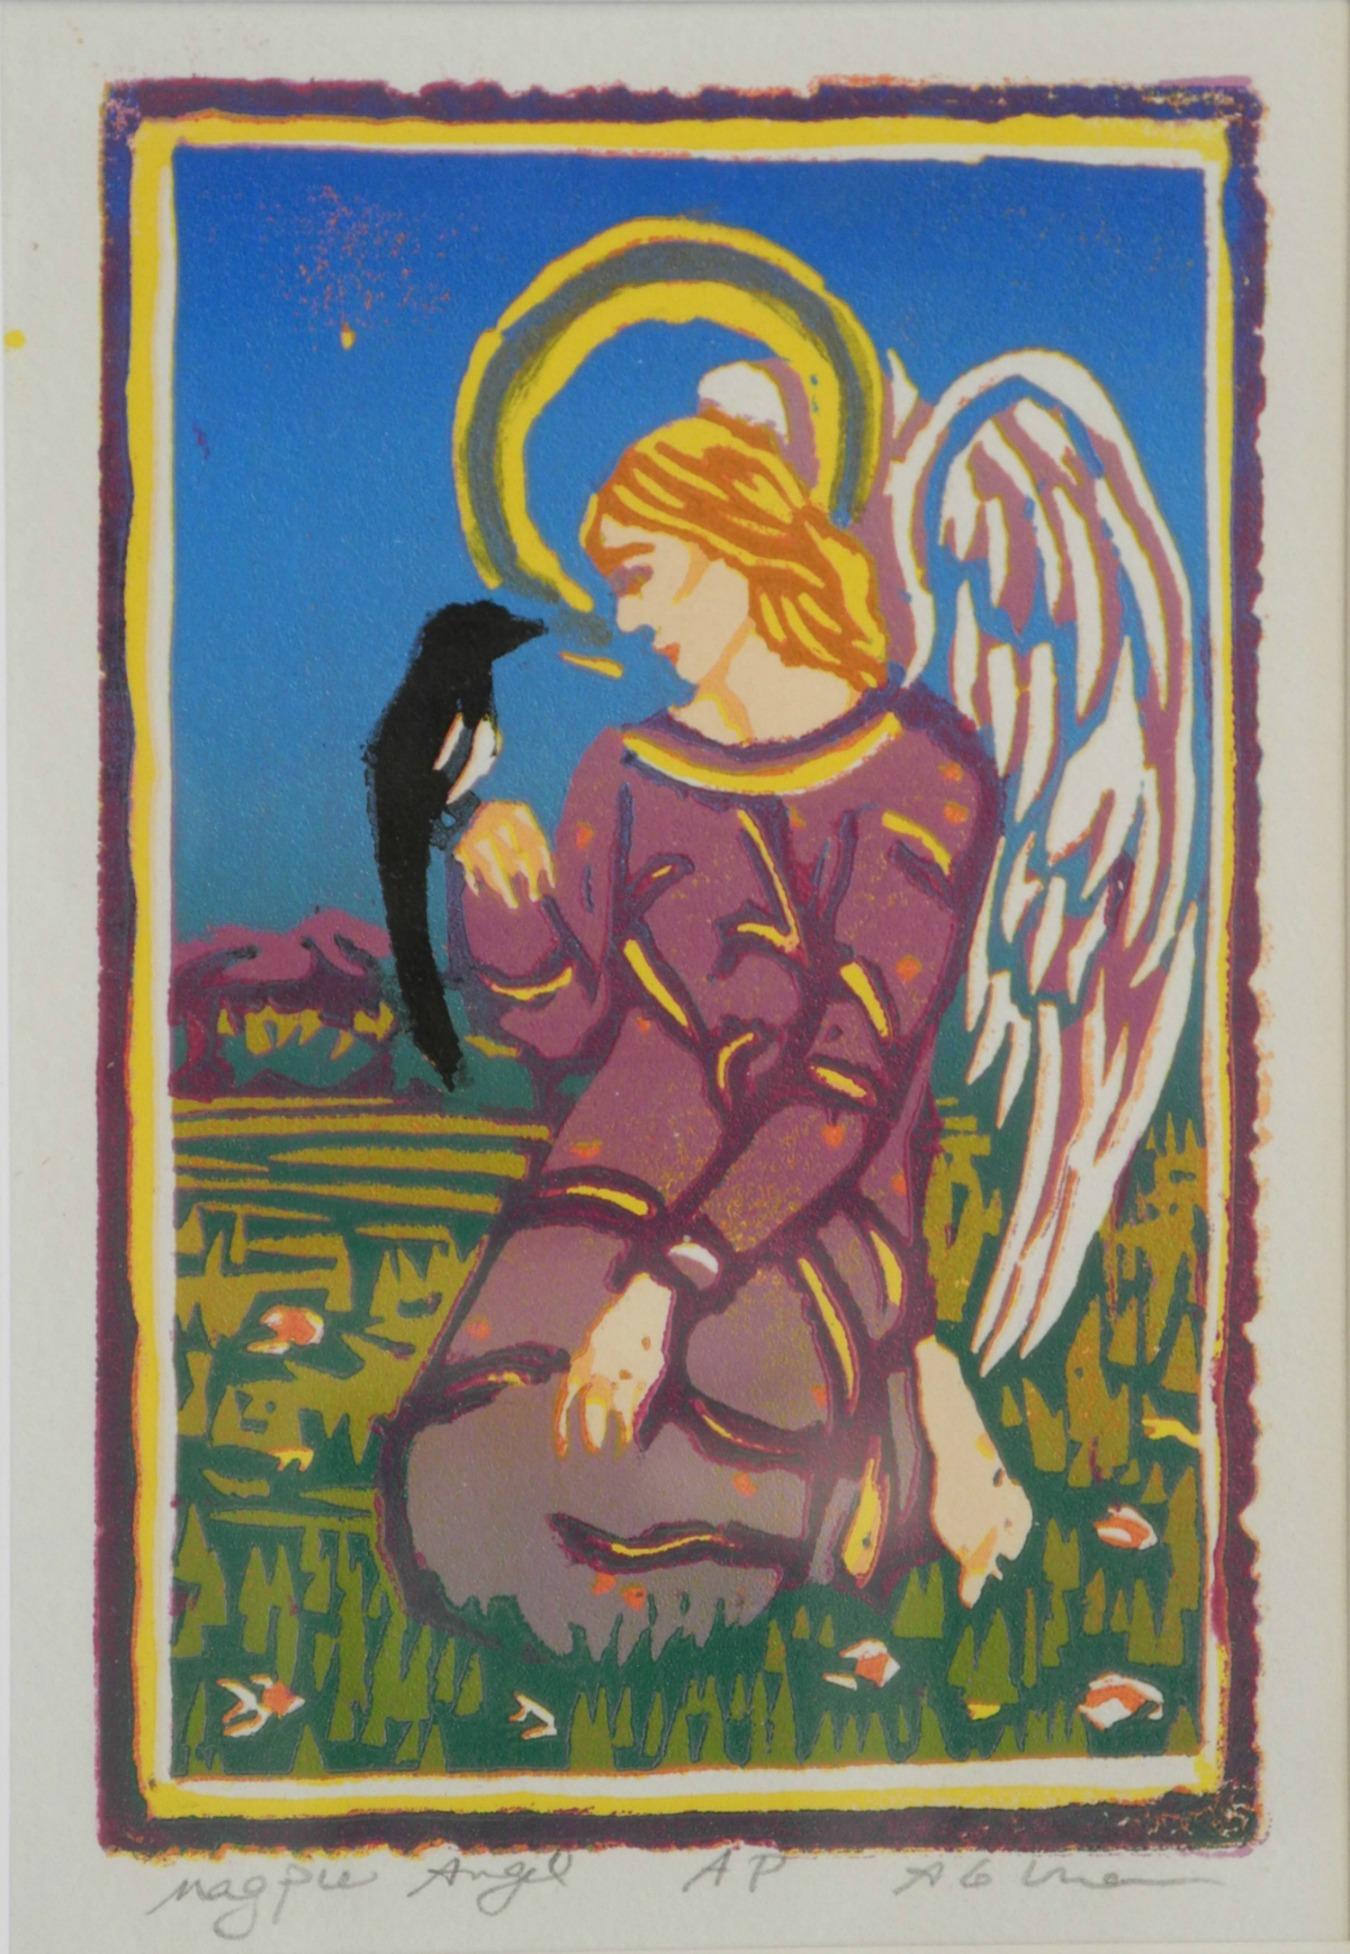 Magpie Angel